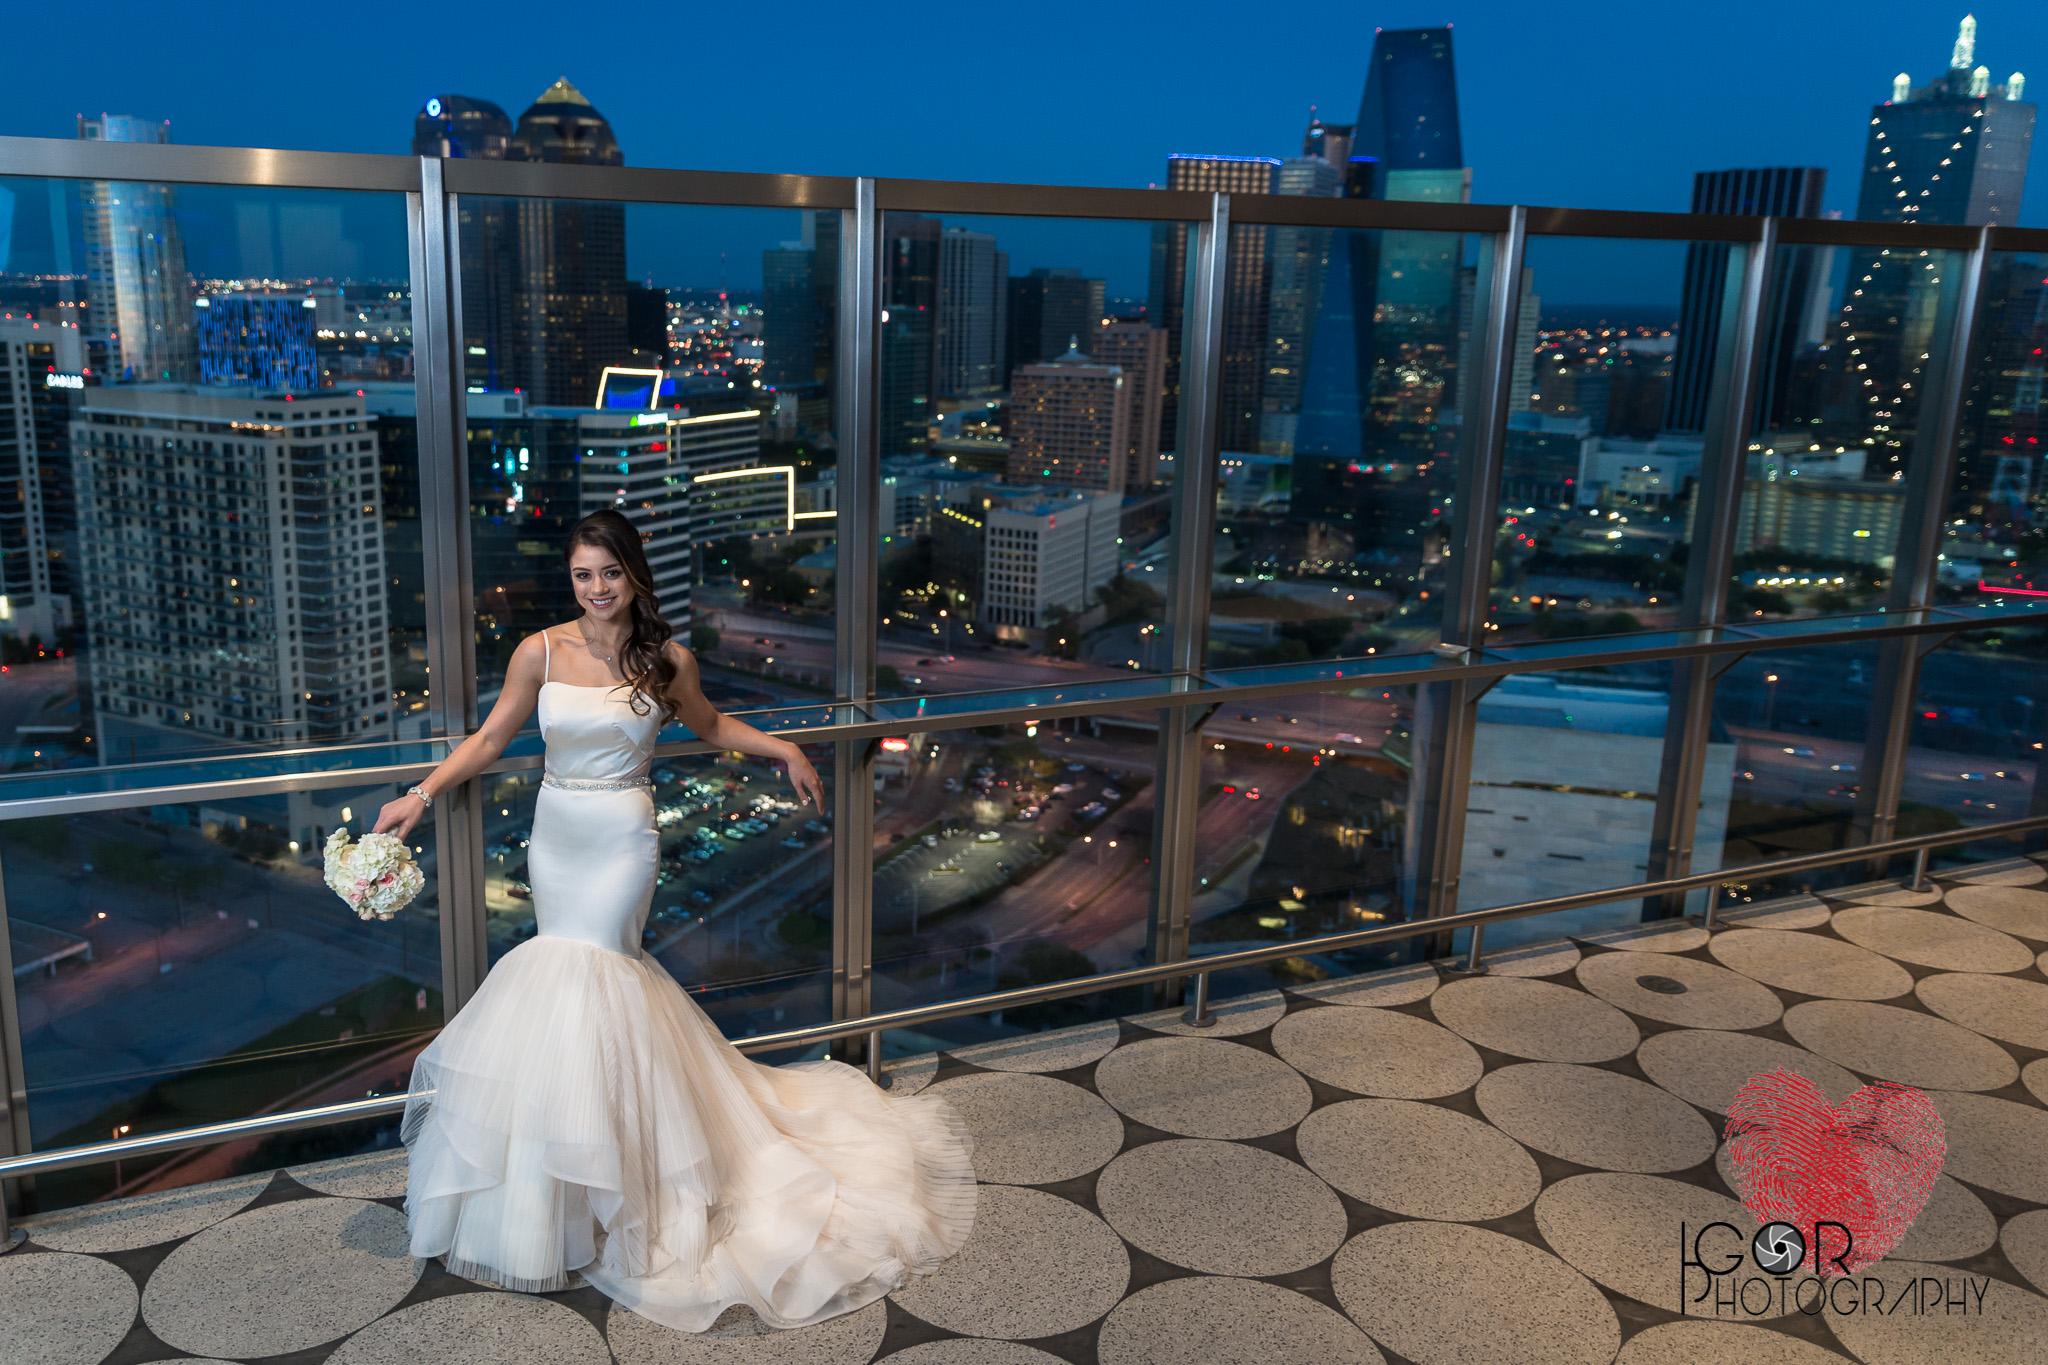 Unique bridal photo